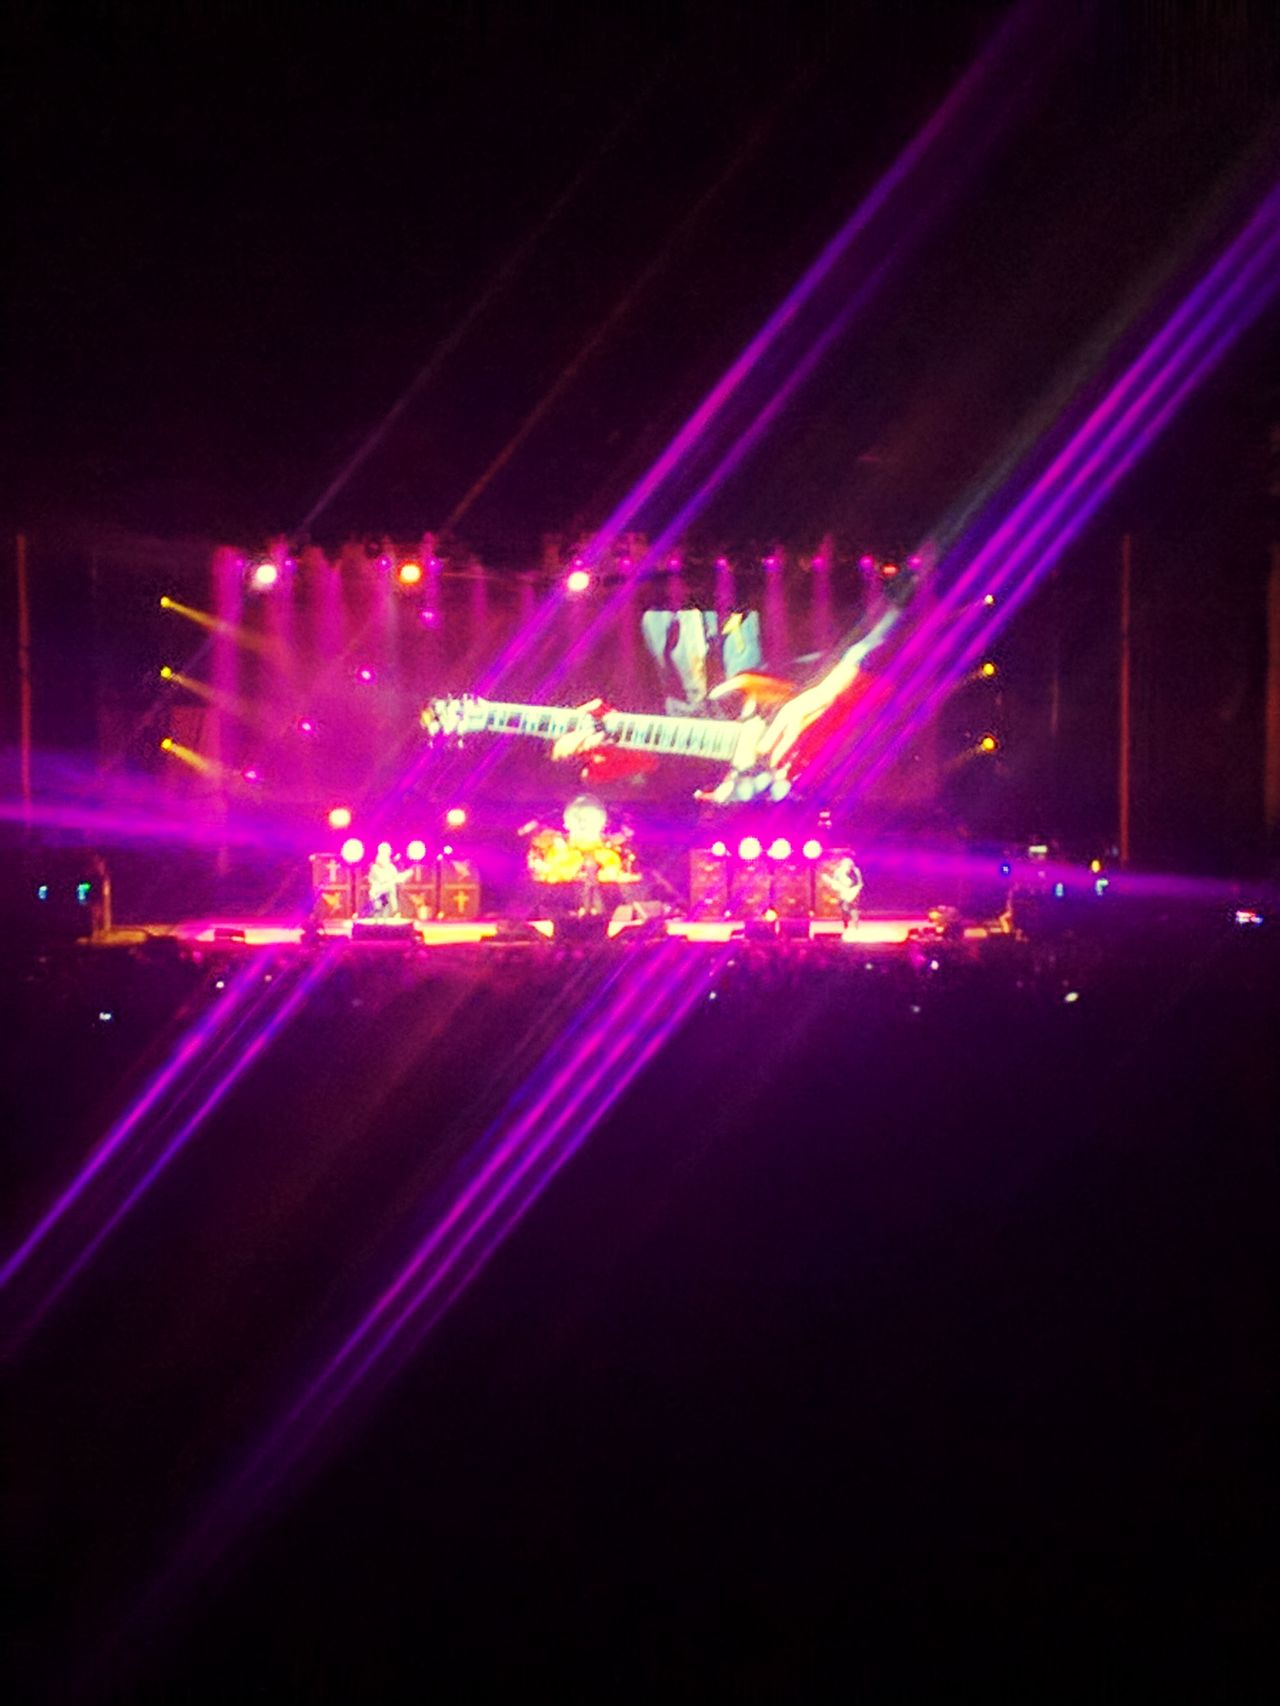 Concert Blacksabbath Heavymetal RockandRoll Ozzy